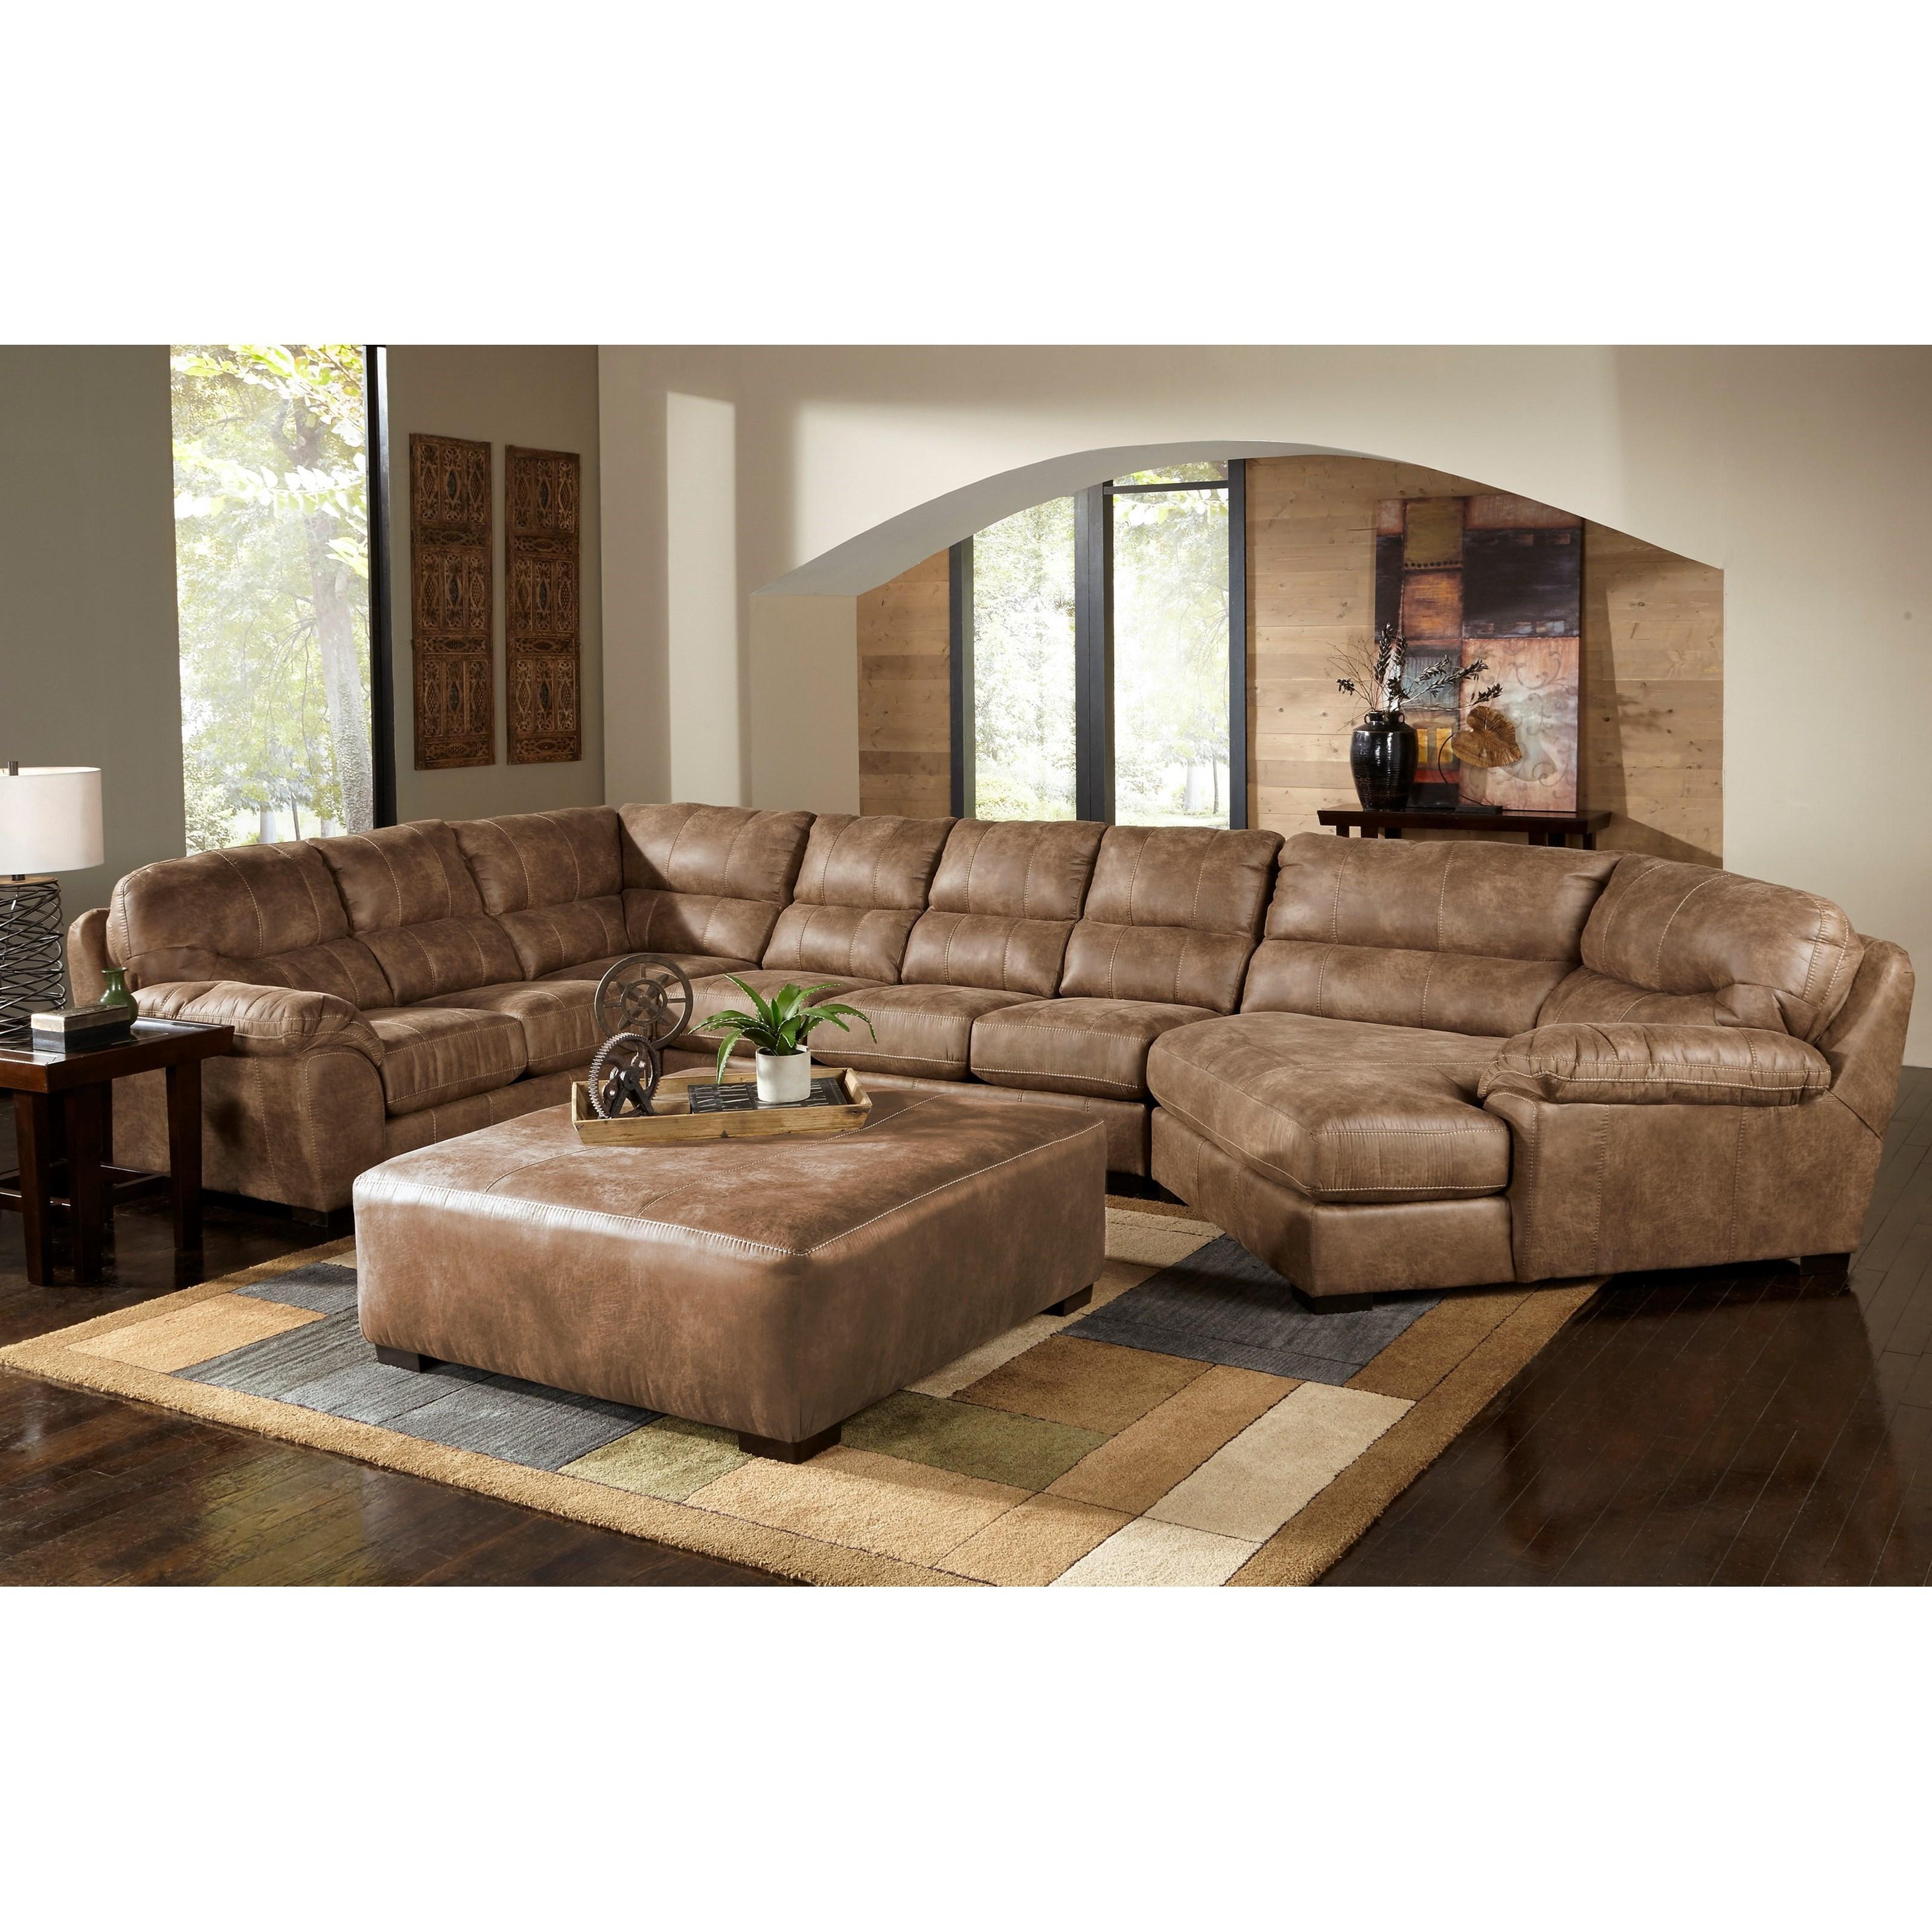 Jackson Furniture Grant Sectional Sofa A1 Mattress Sofas